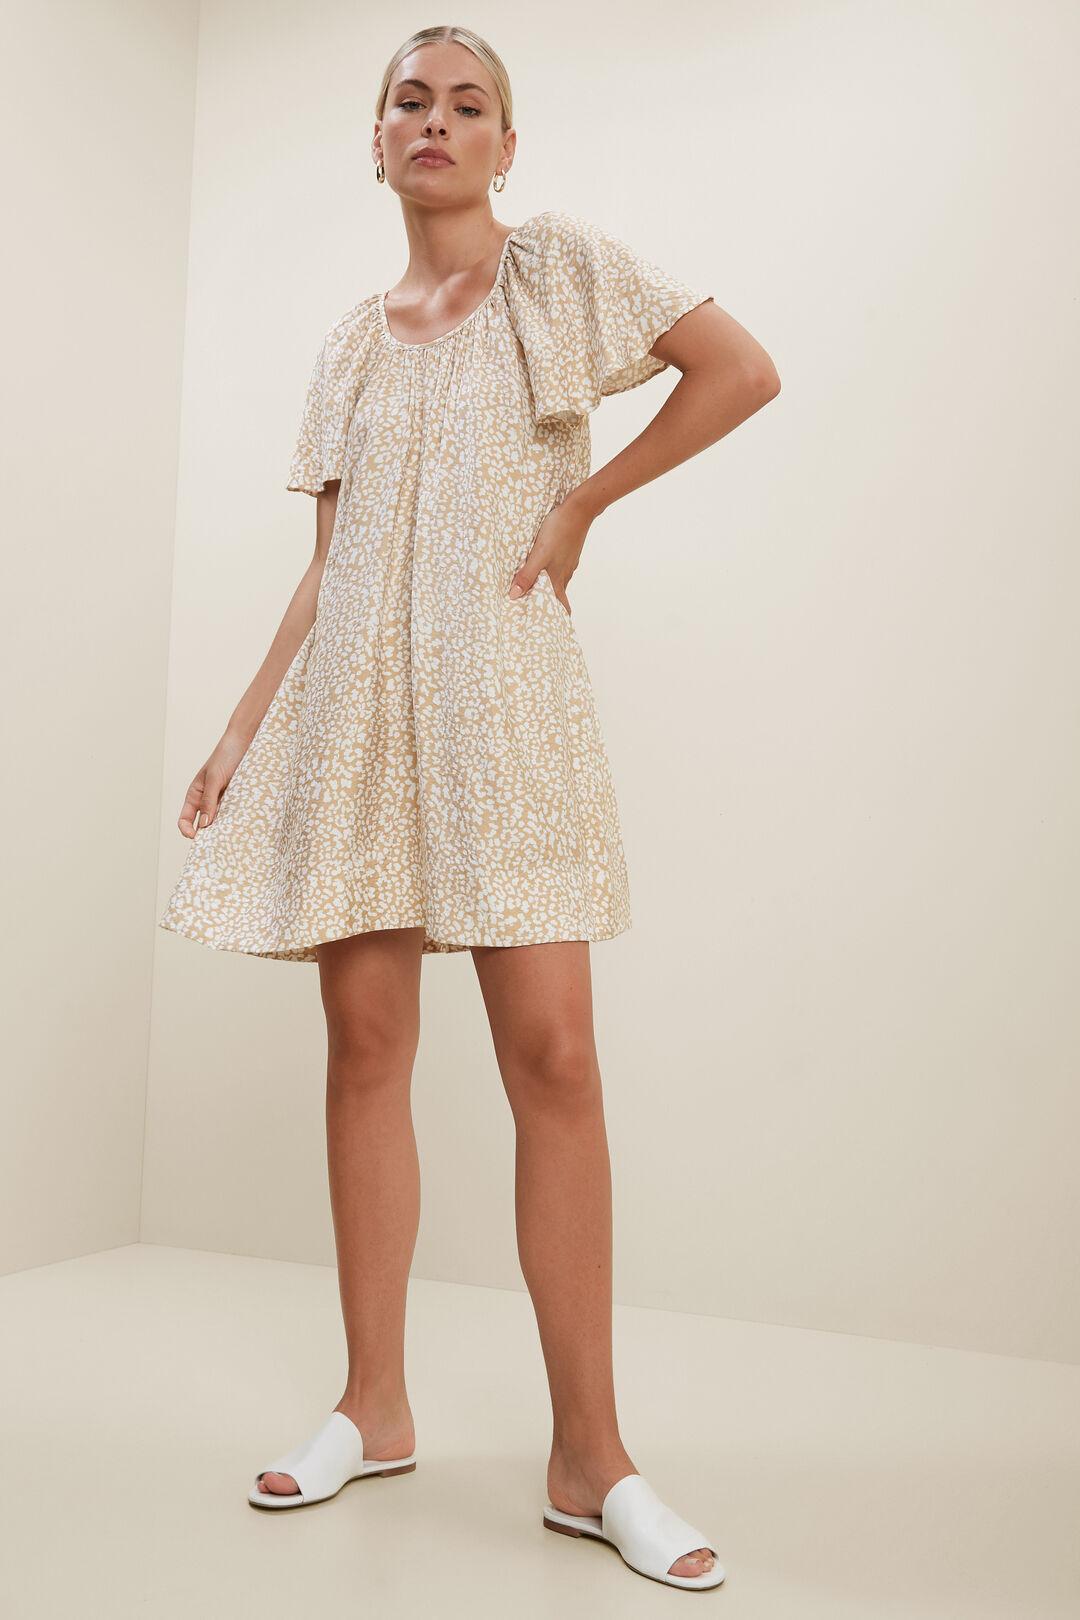 Ocelot Swing Mini Dress  OCELOT  hi-res